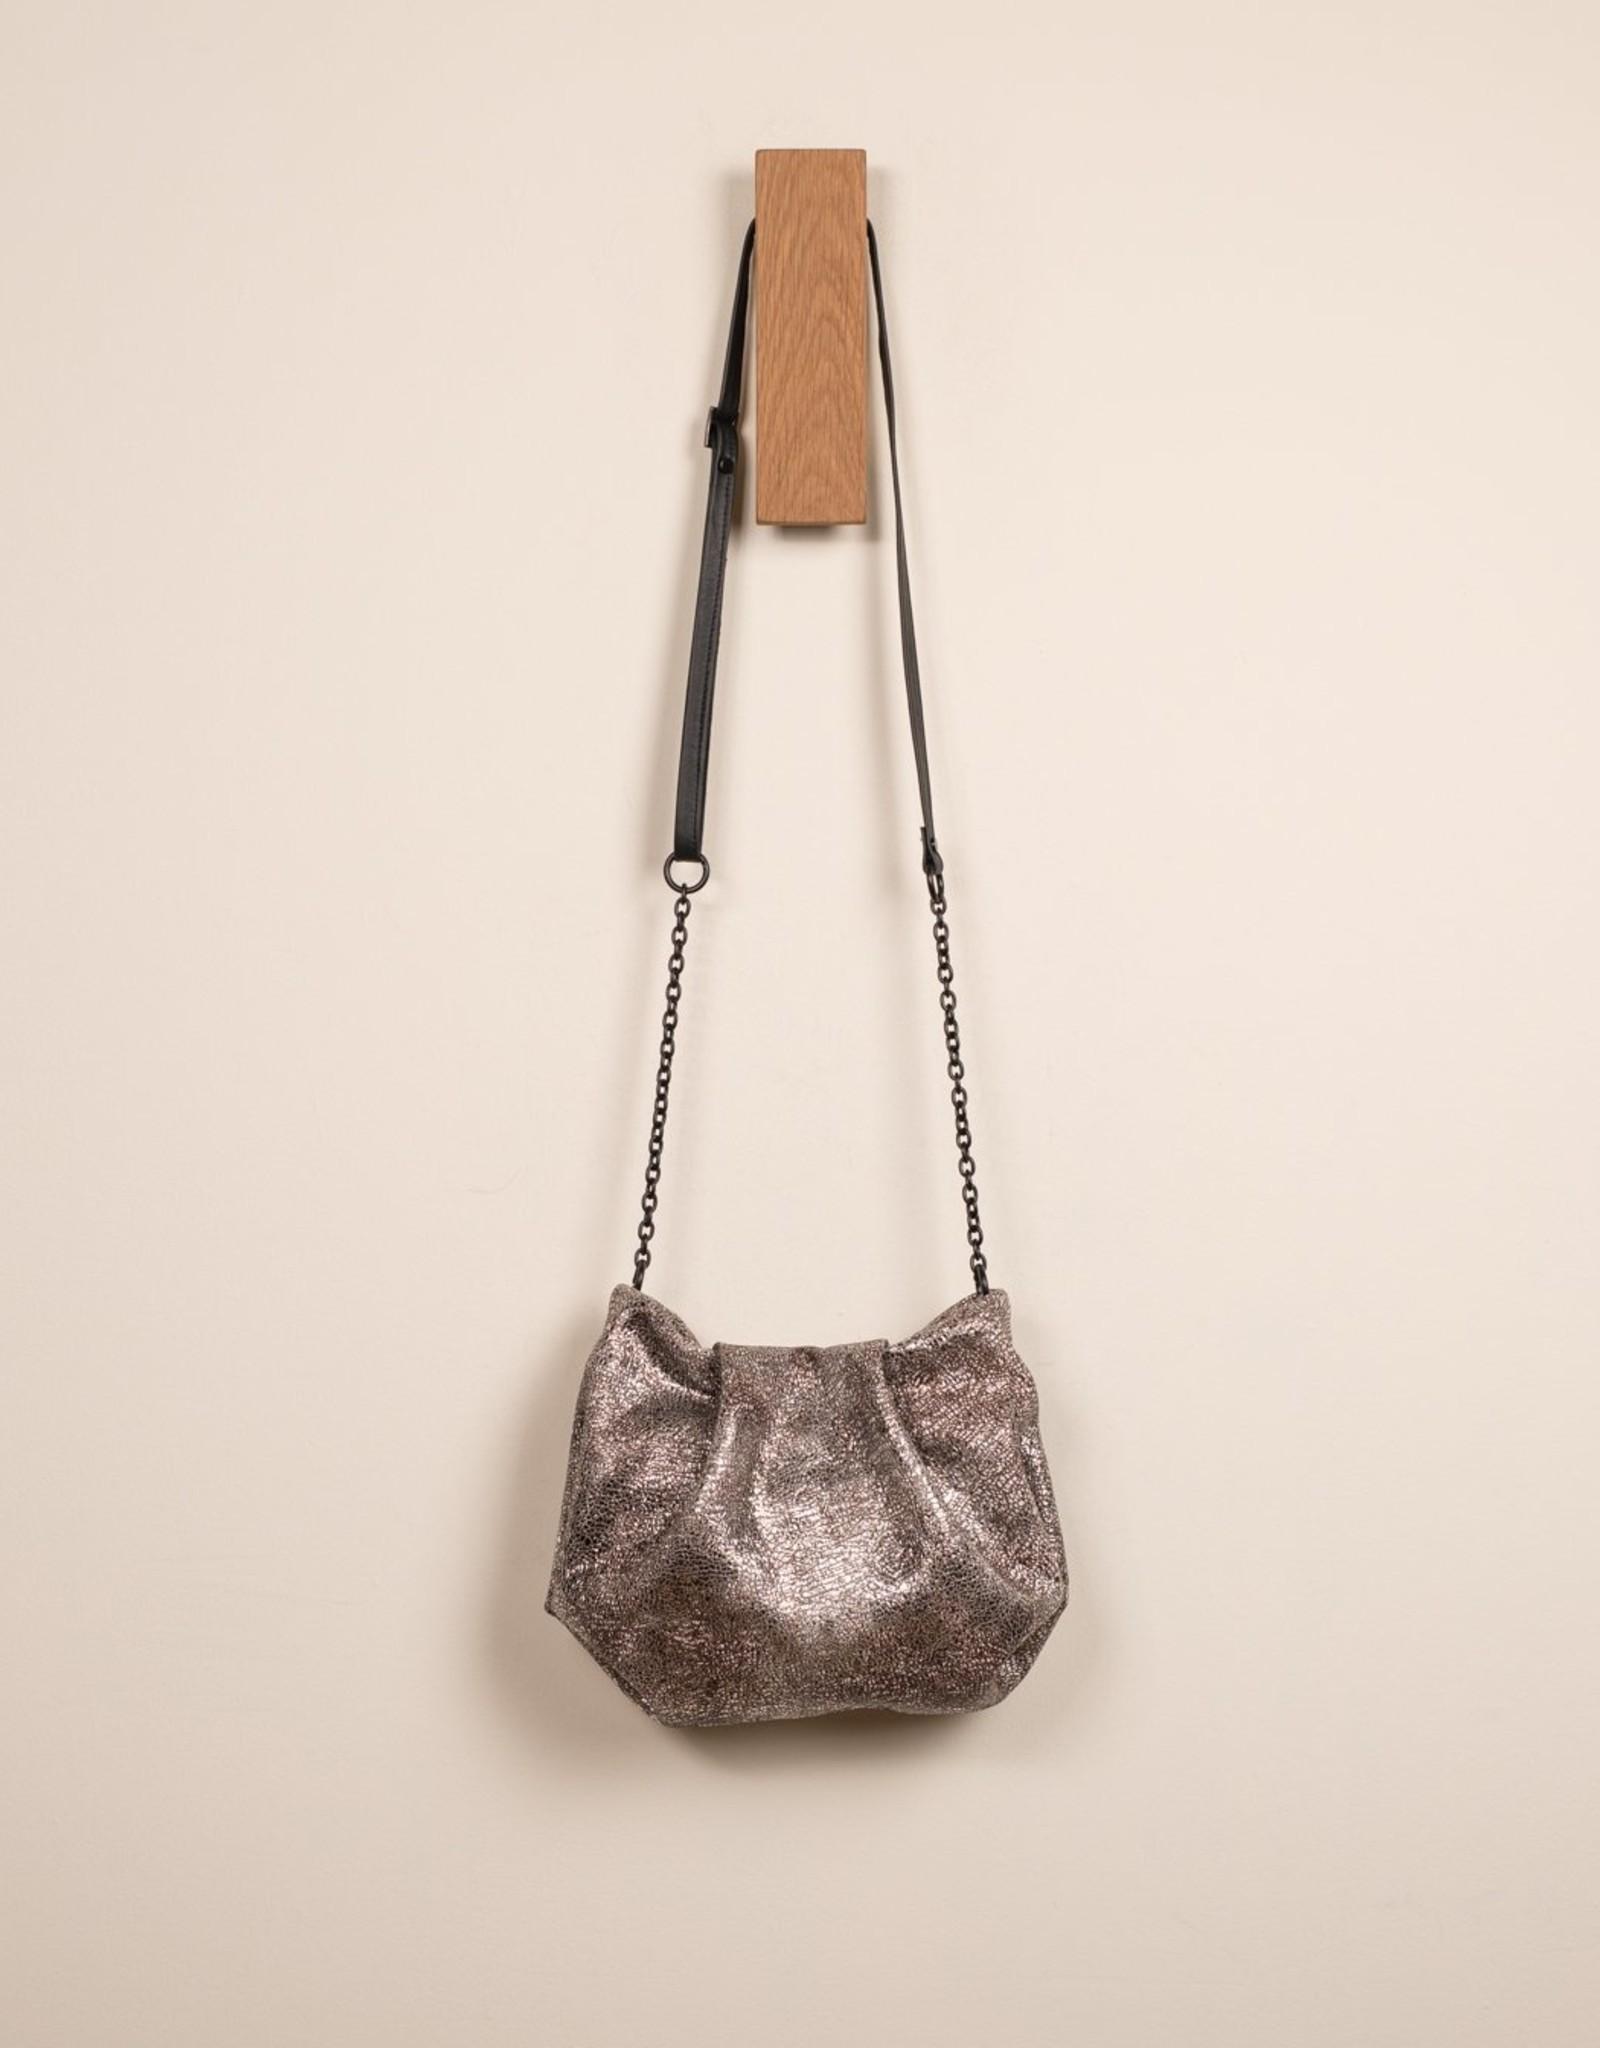 Daniella Lehavi Bali Bag